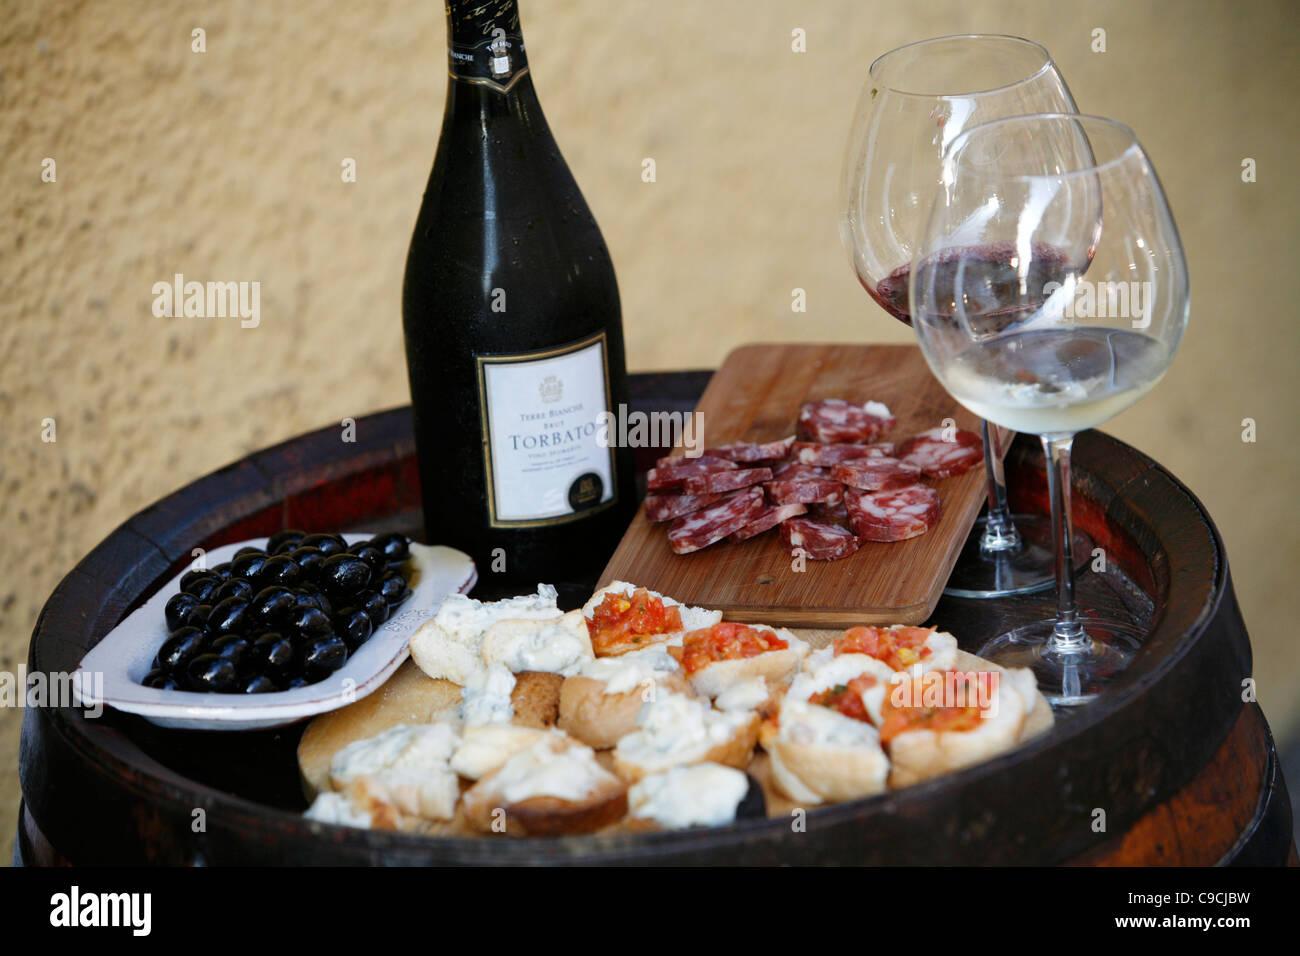 Plate of cheese, salami, olives and wine at Osteria Da Lio, La Maddalena, Sardinia, Italy. - Stock Image